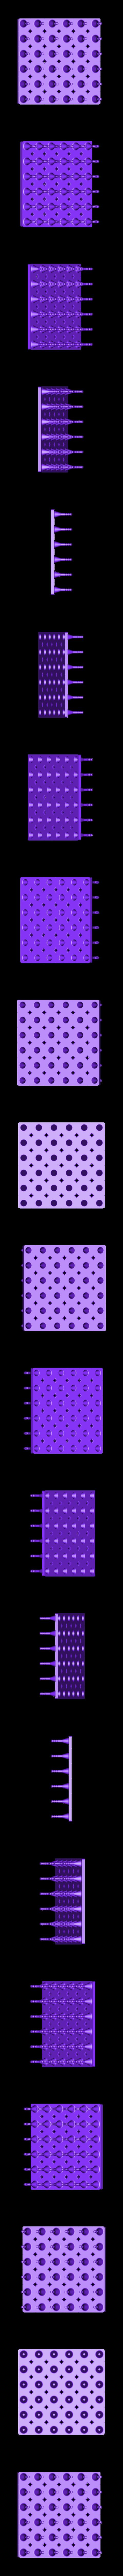 GeoBoard6x6_A.stl Download free STL file Geoboard, Geometric Board, Cartesian, Isometic, Circular, Geometry, Math • 3D printer object, LGBU